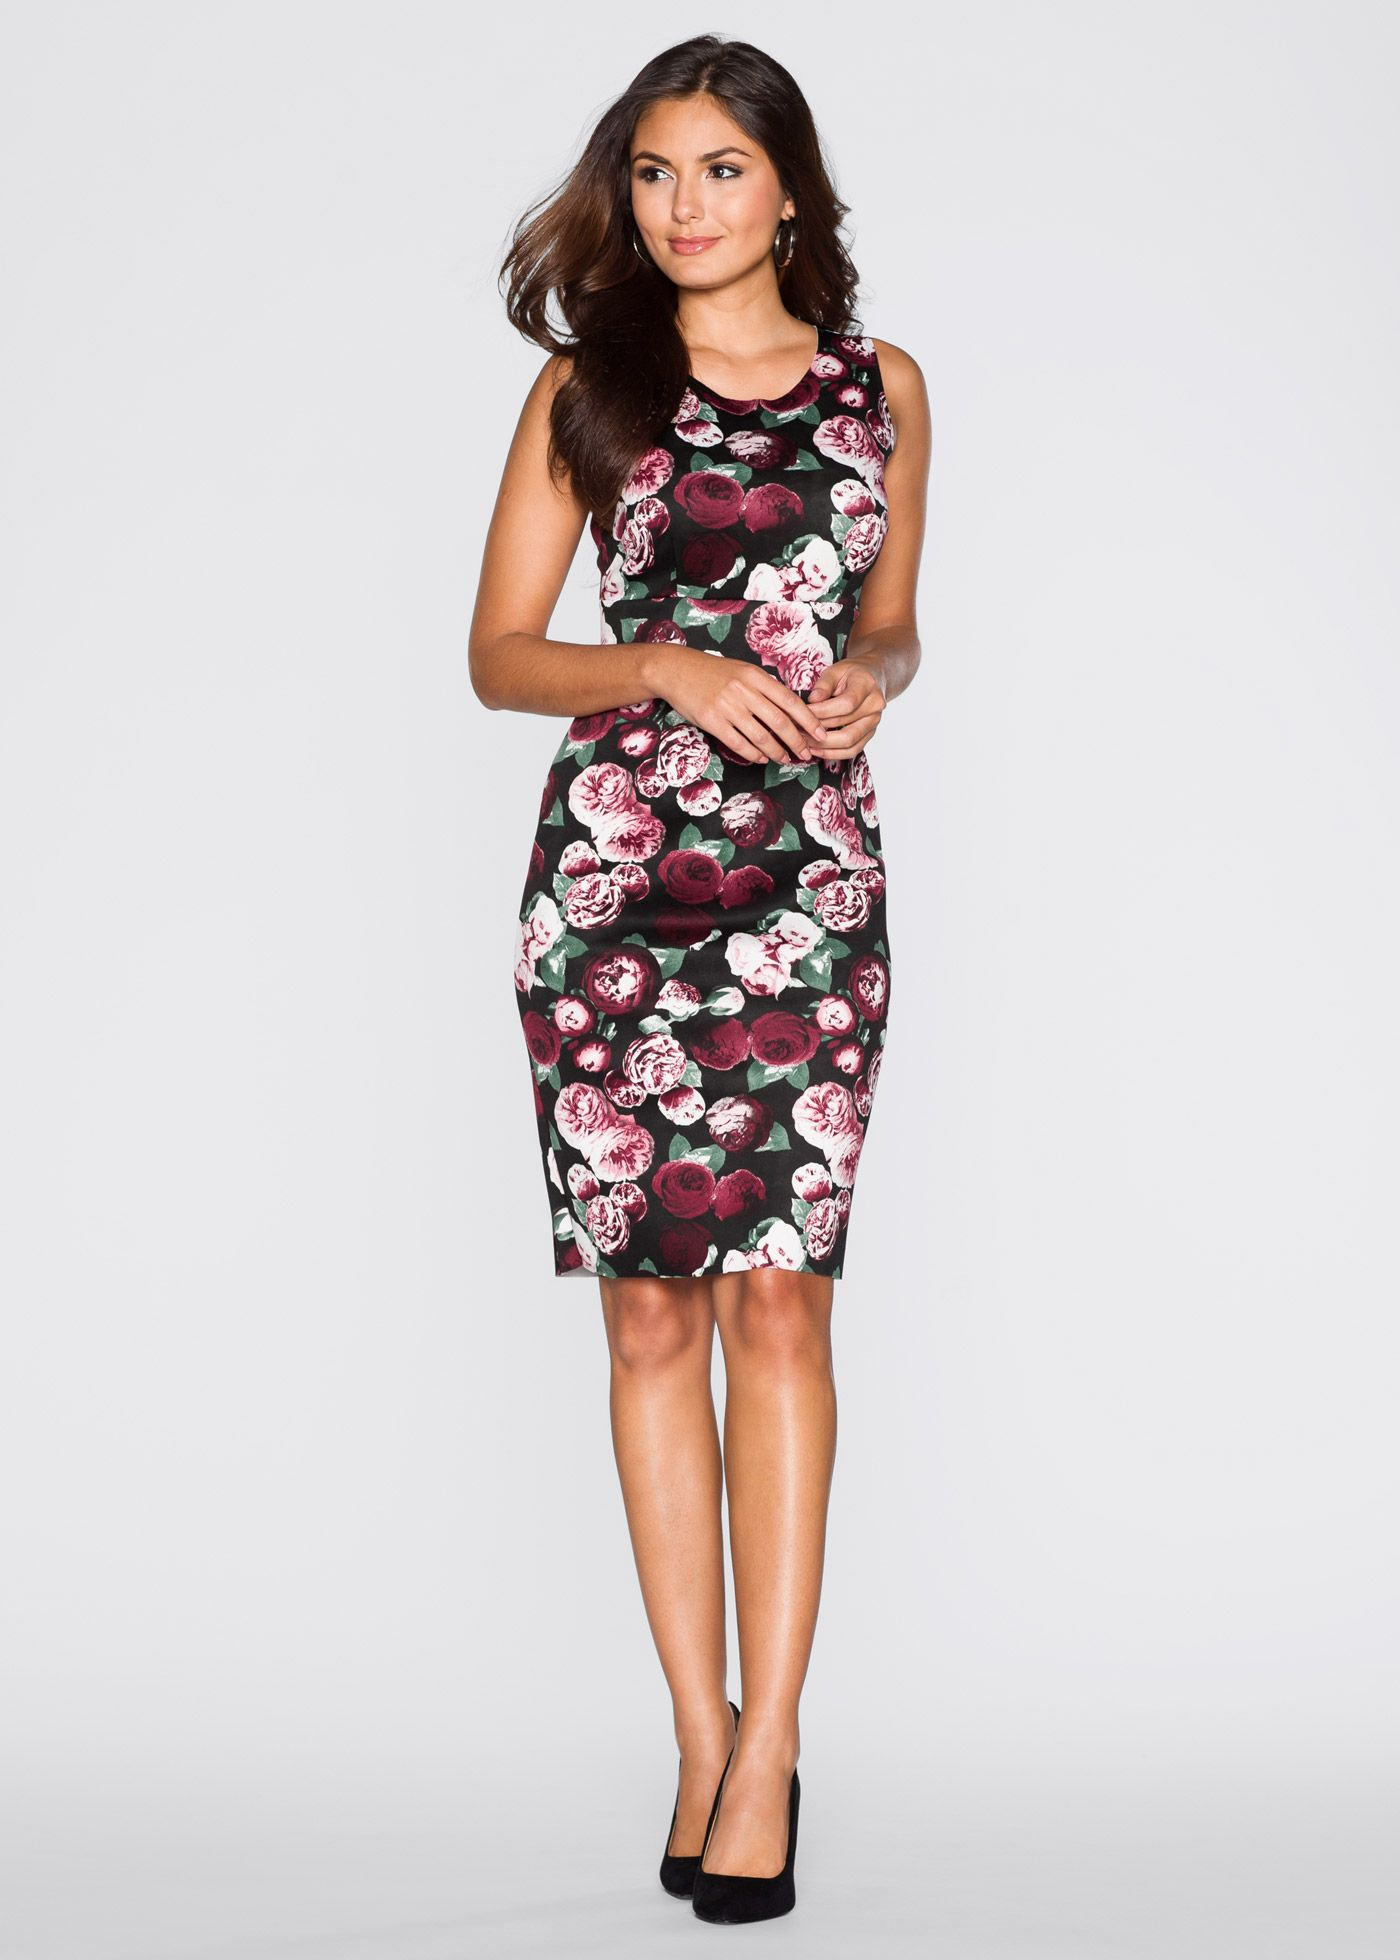 Apartes Kleid aus figurformendem Scuba-Material | Scuba-kleid ...